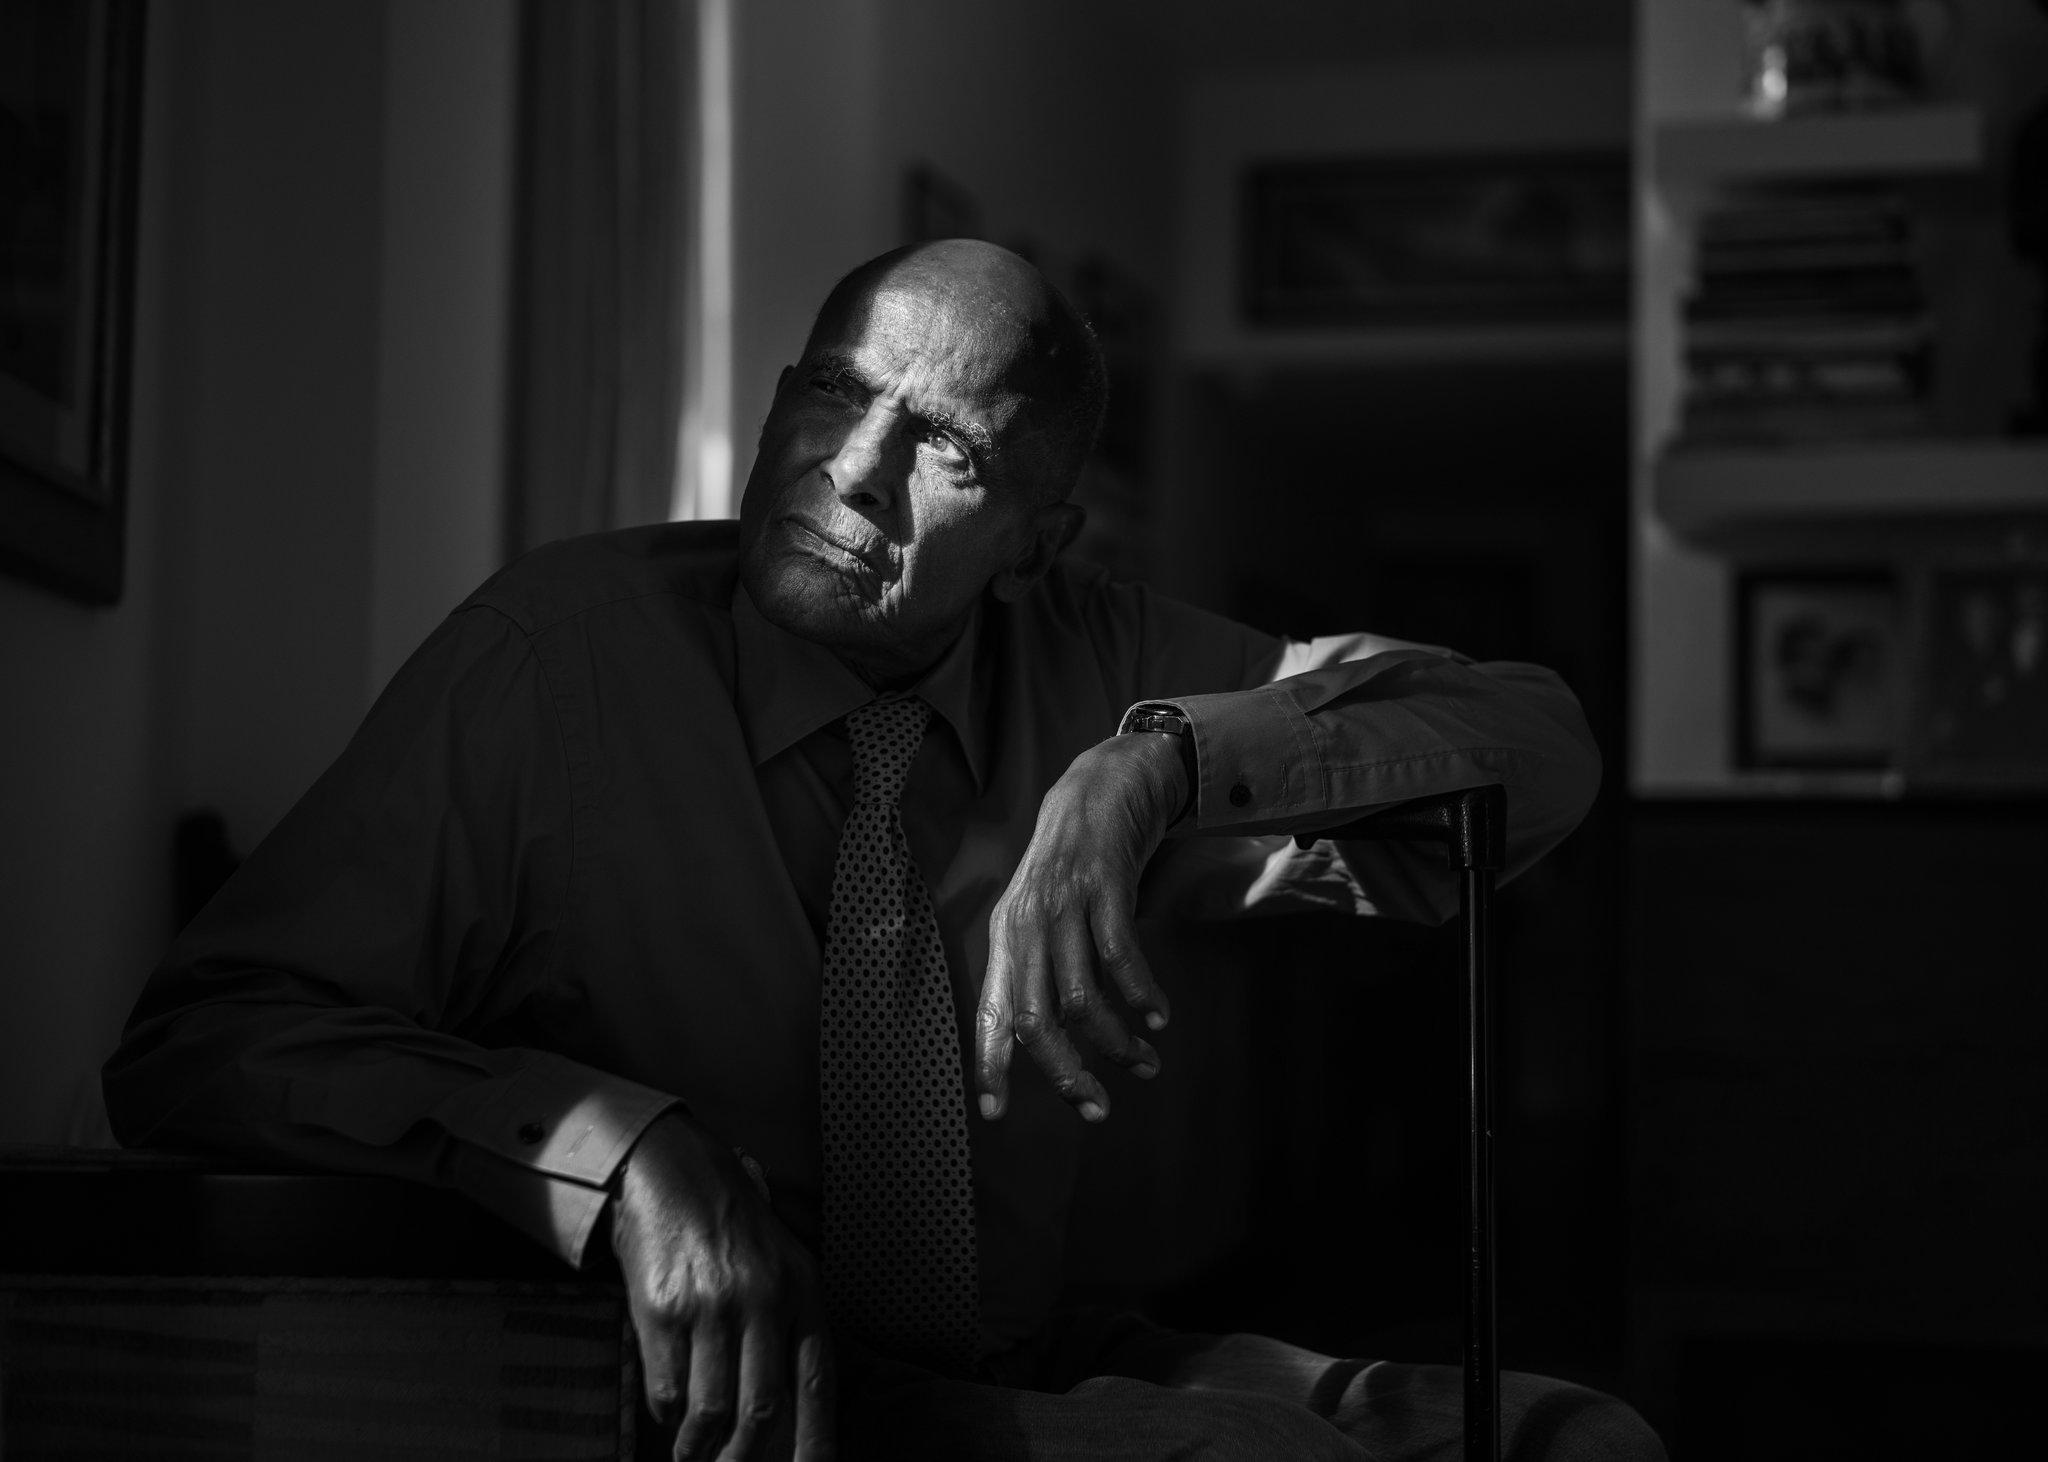 Harry Belafonte, Civil Rights, African American Art, African American Film, African American Entertainer, Black Art, Black Actor, African American History, Black History, KOLUMN Magazine, KOLUMN